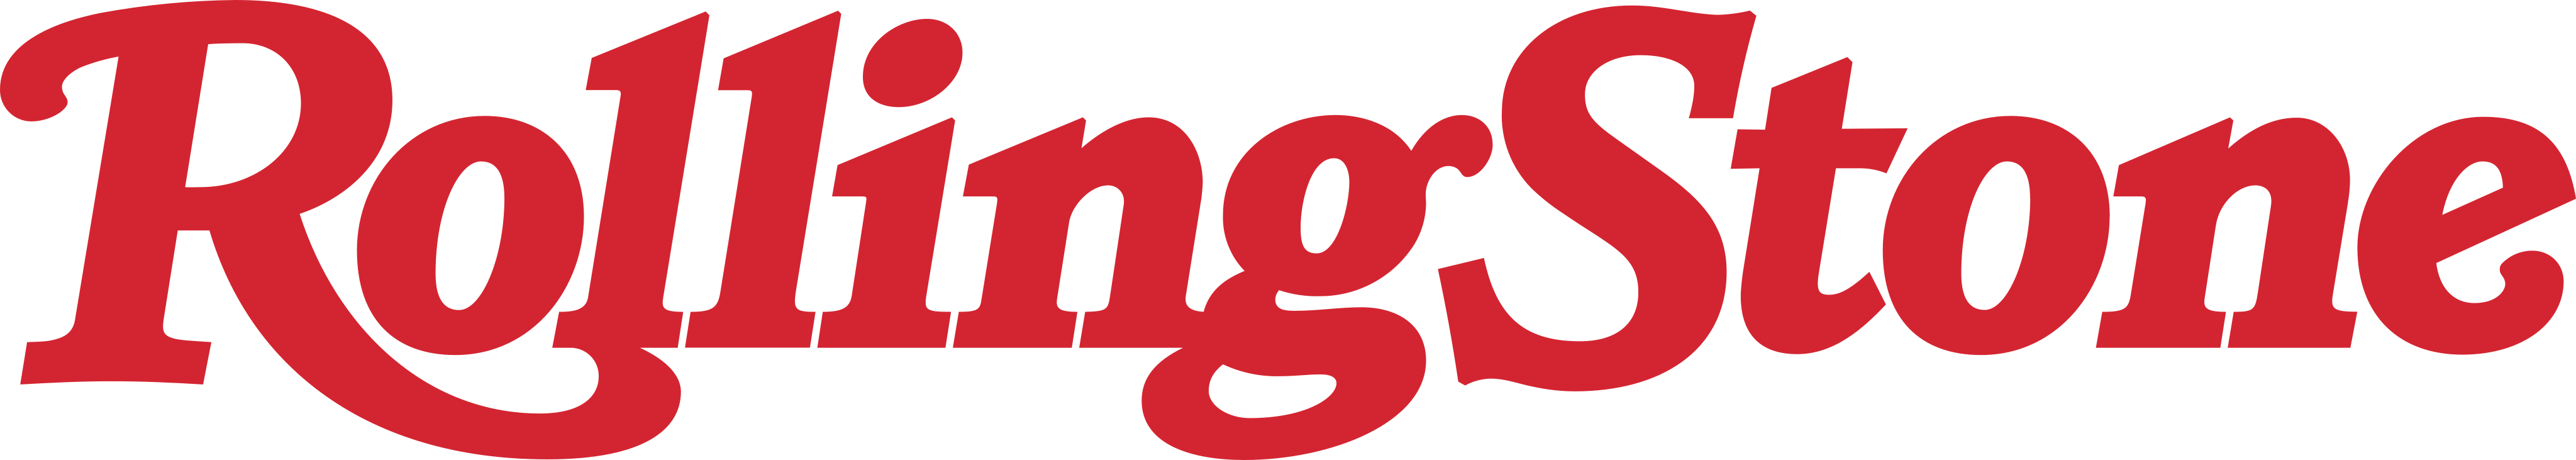 Rolling Stone Logo.